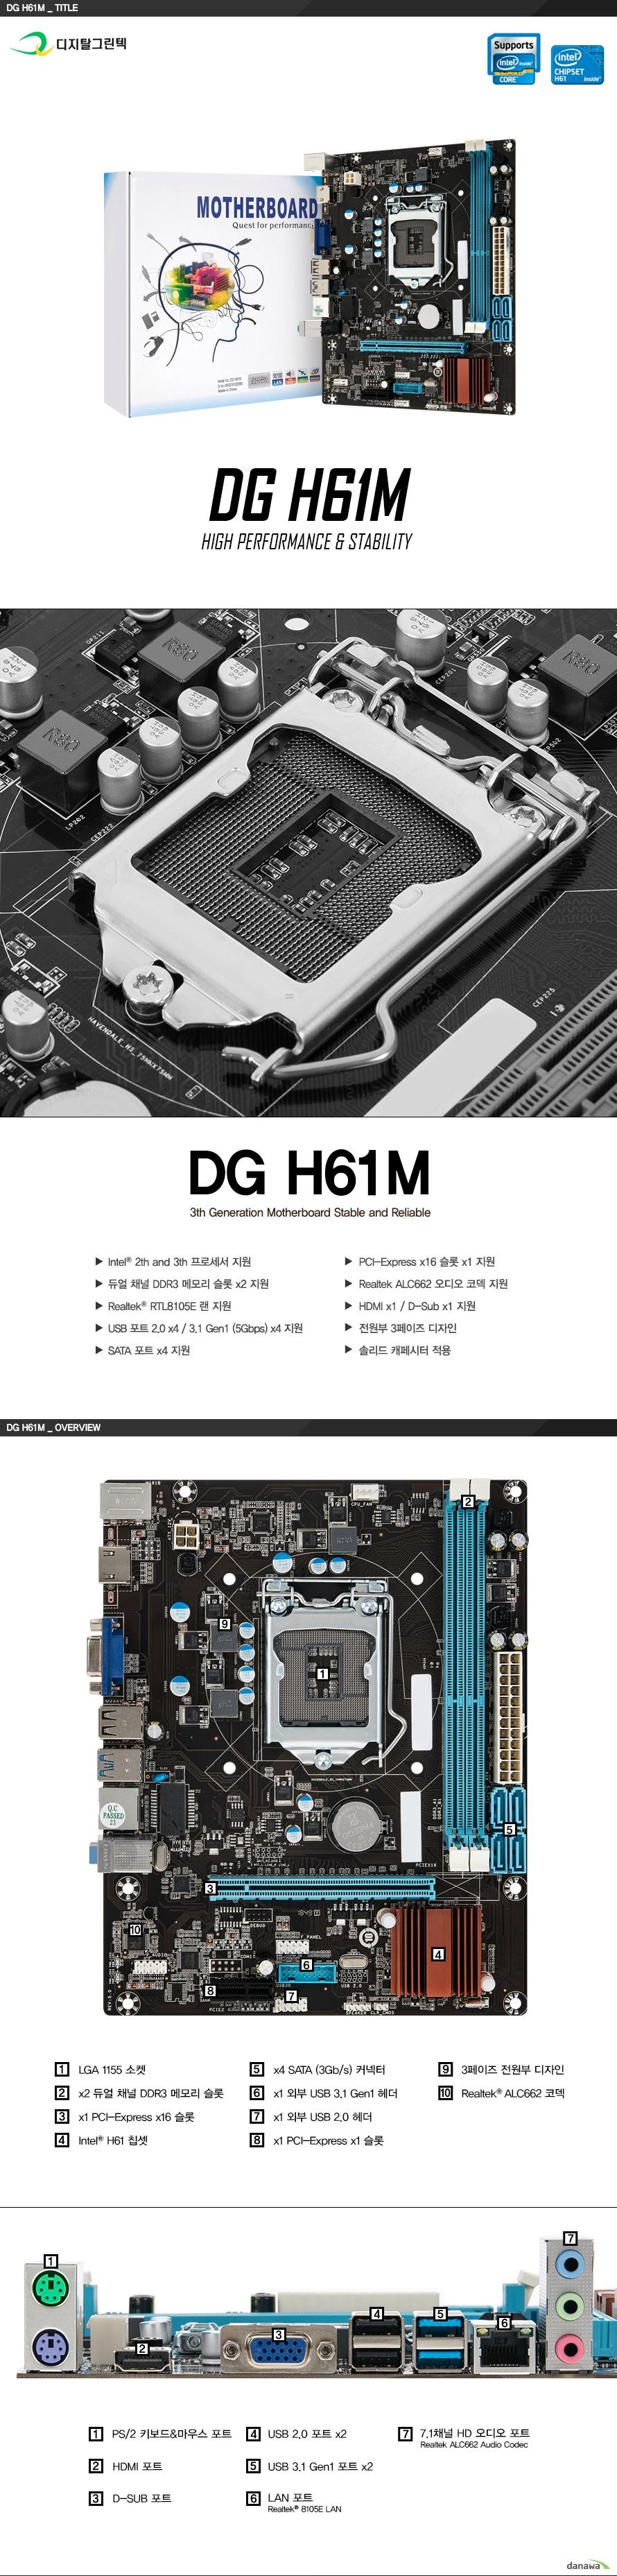 DG H61M 디지탈그린텍  2세대 및 3세대 인텔 코어 프로세서 지원 인텔 h61 칩셋 적용 듀얼 채널 ddr3 슬롯 2개, 최대 8기가바이트 지원 1066 1333메가헤르츠 지원  Pci 익스프레스 16배속 슬롯 1개 및 Pci 익스프레스 1배속 슬롯 1개 지원  리얼텍 alc662 6채널 hd 오디오 코덱 적용 리얼텍 rtl8111e 기가비트 랜 지원  Usb 3.1 gen1 포트 4개 및 usb 2.0 포트 4개 지원  kc인증 R R GRT DGH61M